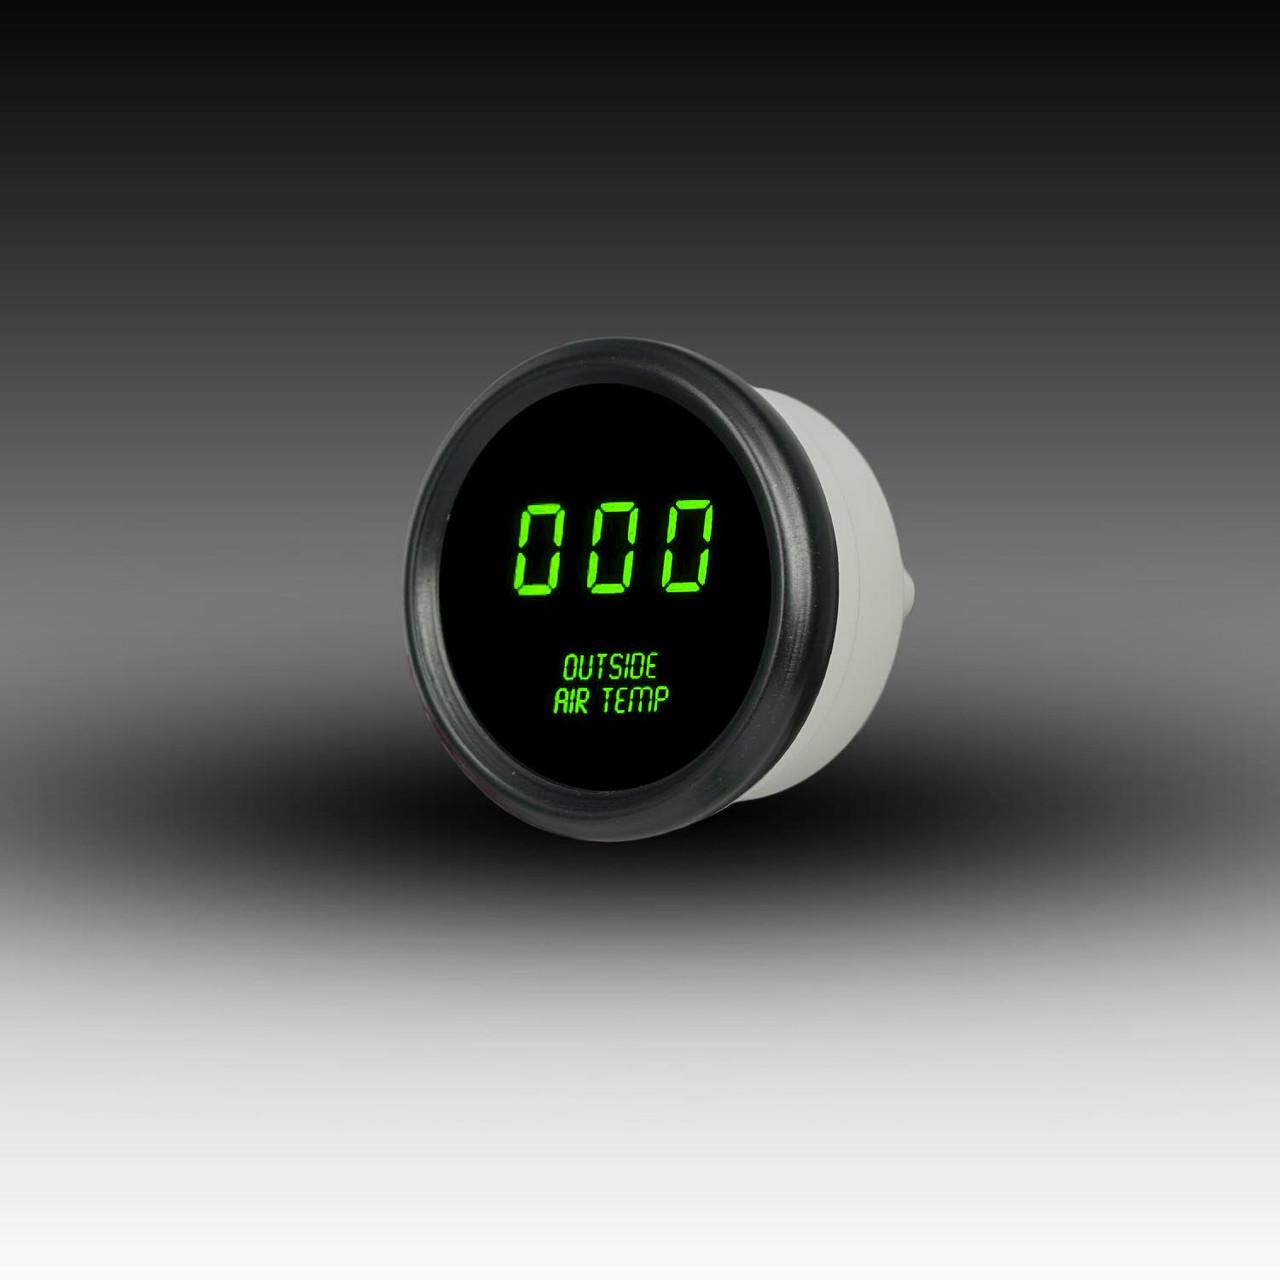 Outside Air Temperature LED Digital Black Bezel - GREEN